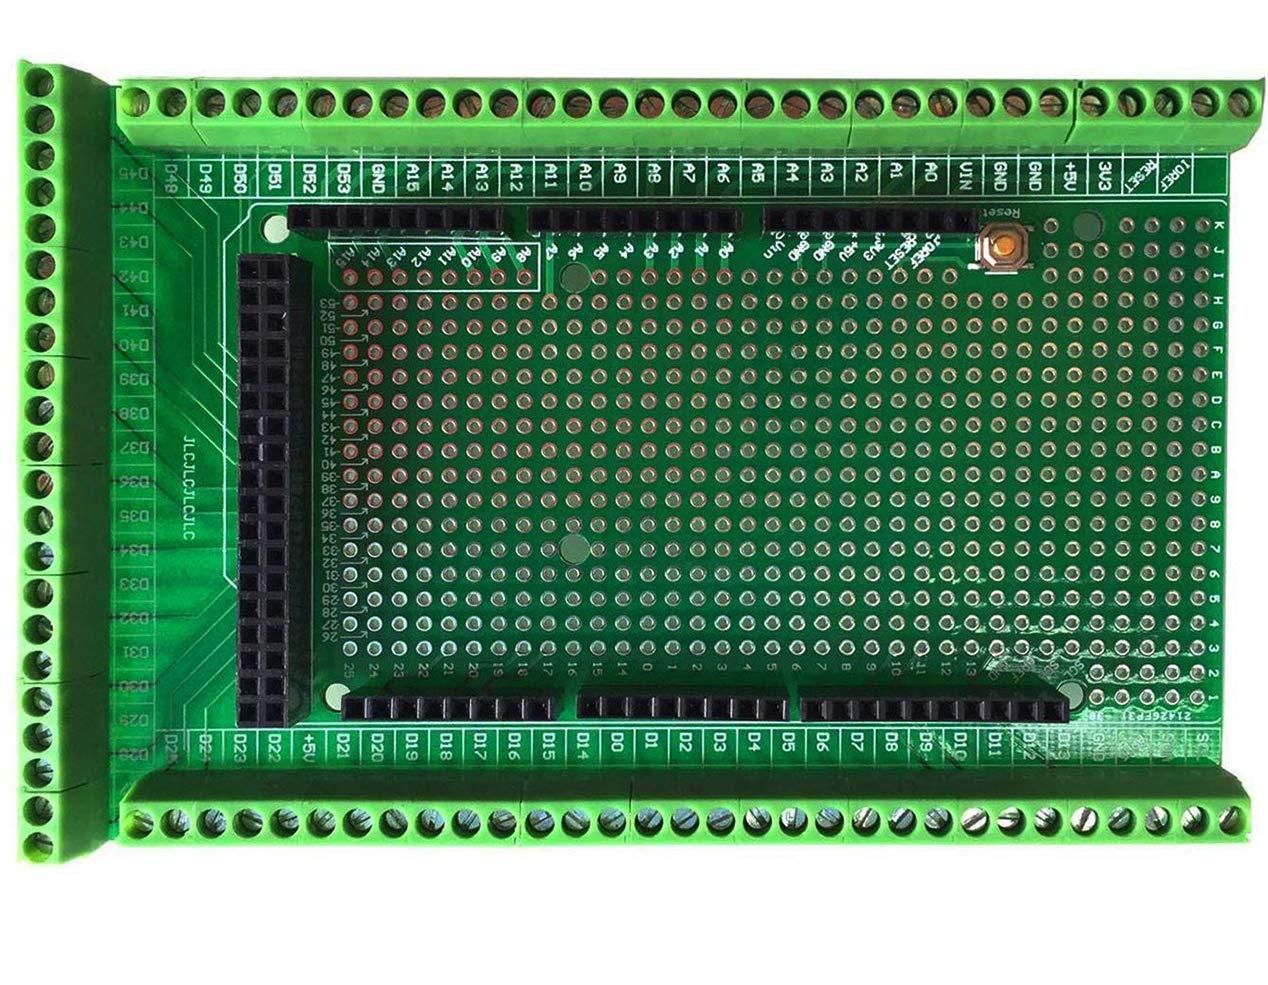 Neu MEGA-2560 Schraubklemmenblock Terminal Block Board Für Arduino Prototyp